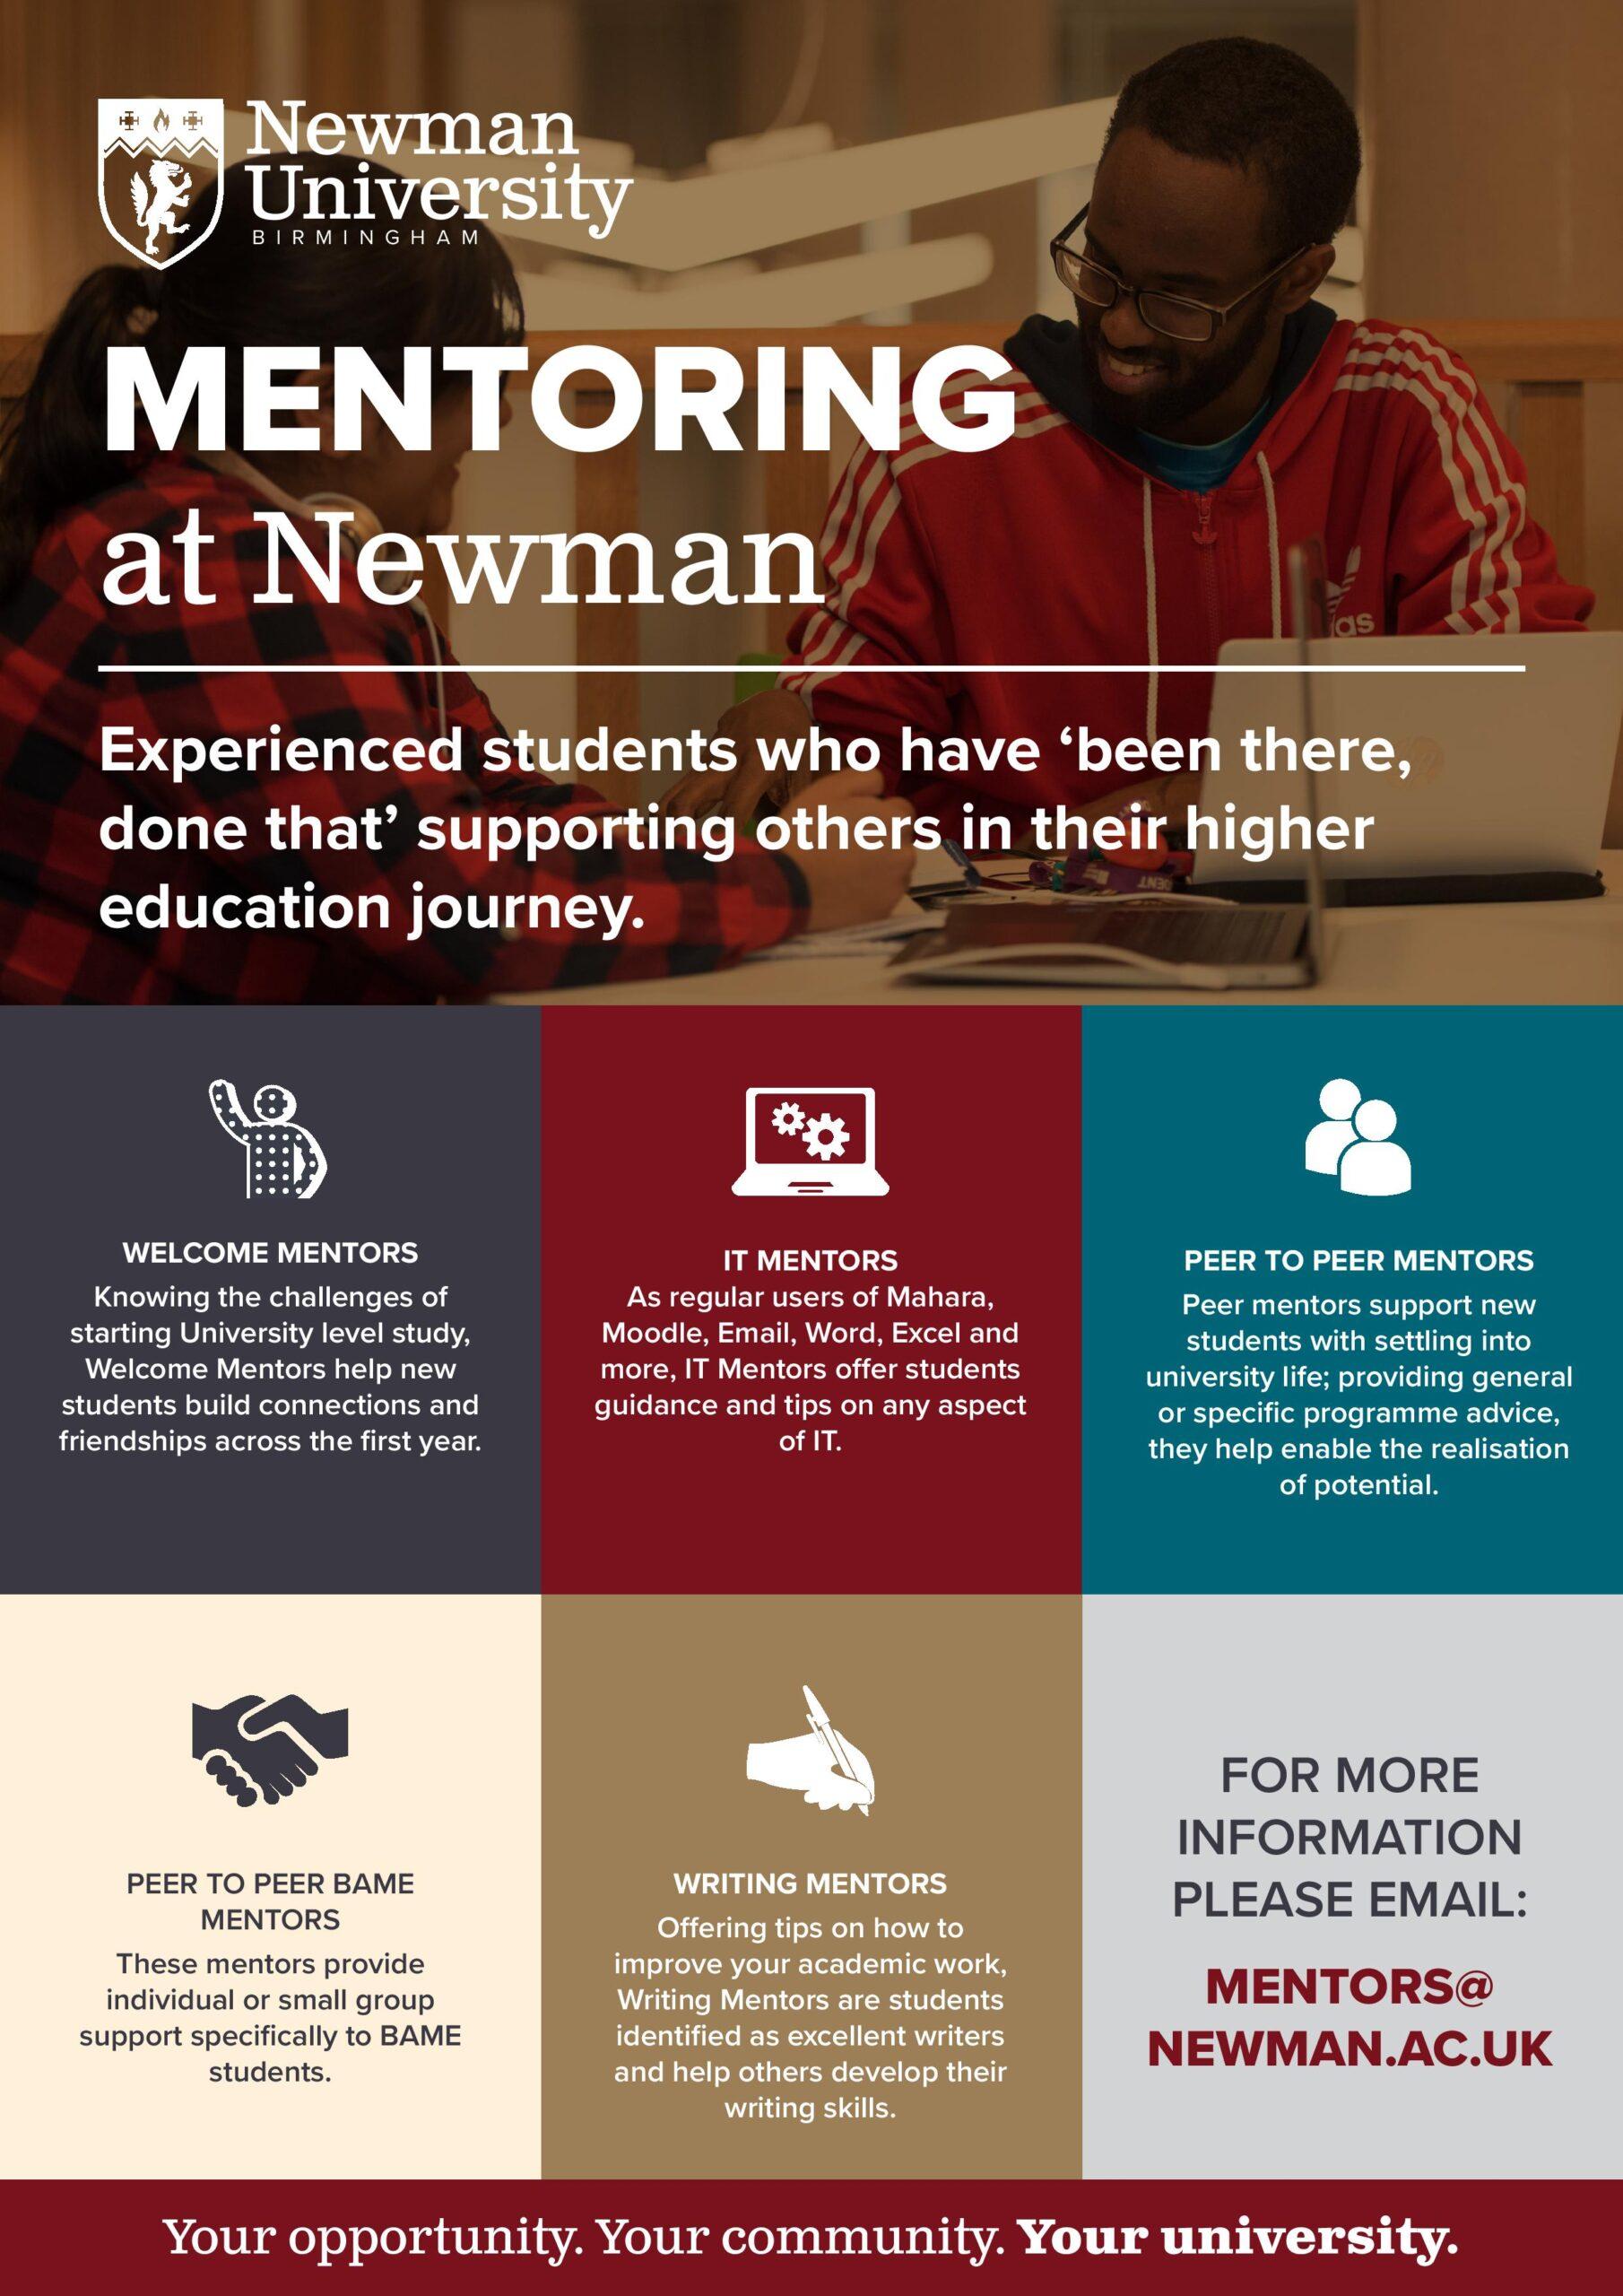 Mentoring at Newman University